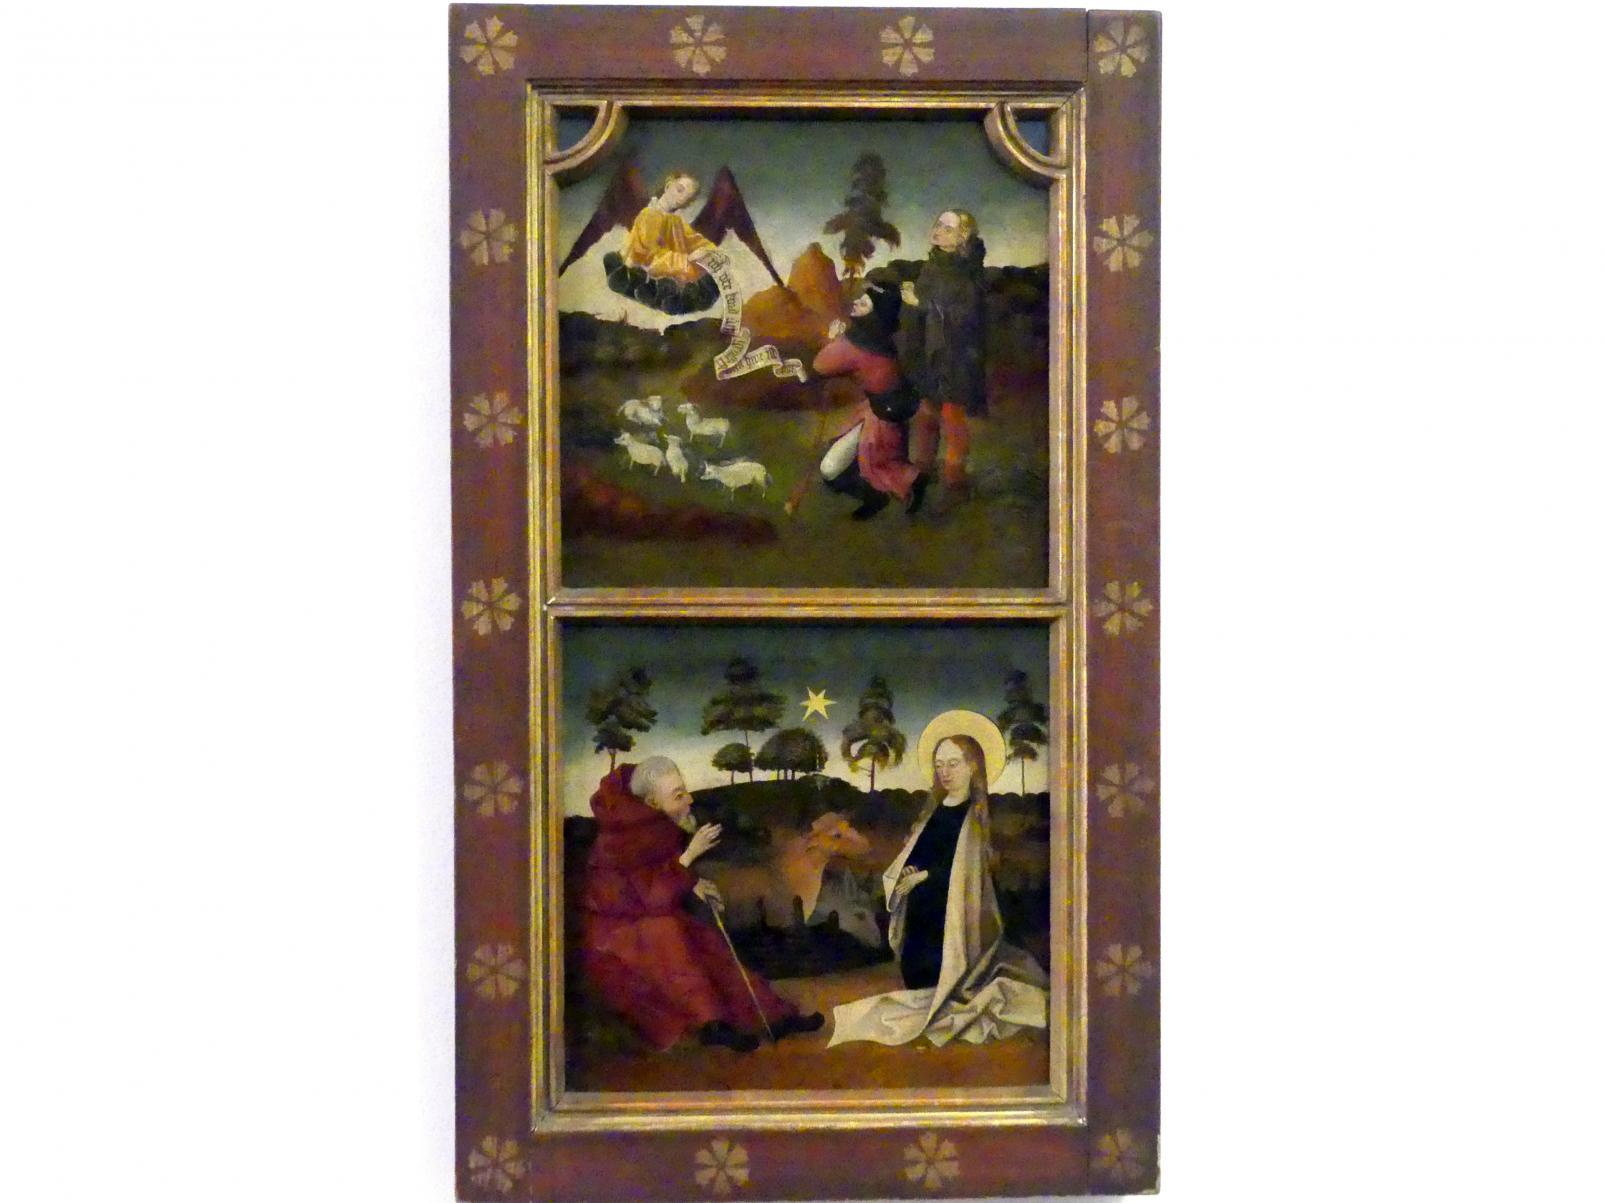 Erwartung der Geburt Christi, Verkündigung an die Hirten, 3. Viertel 15. Jhd.